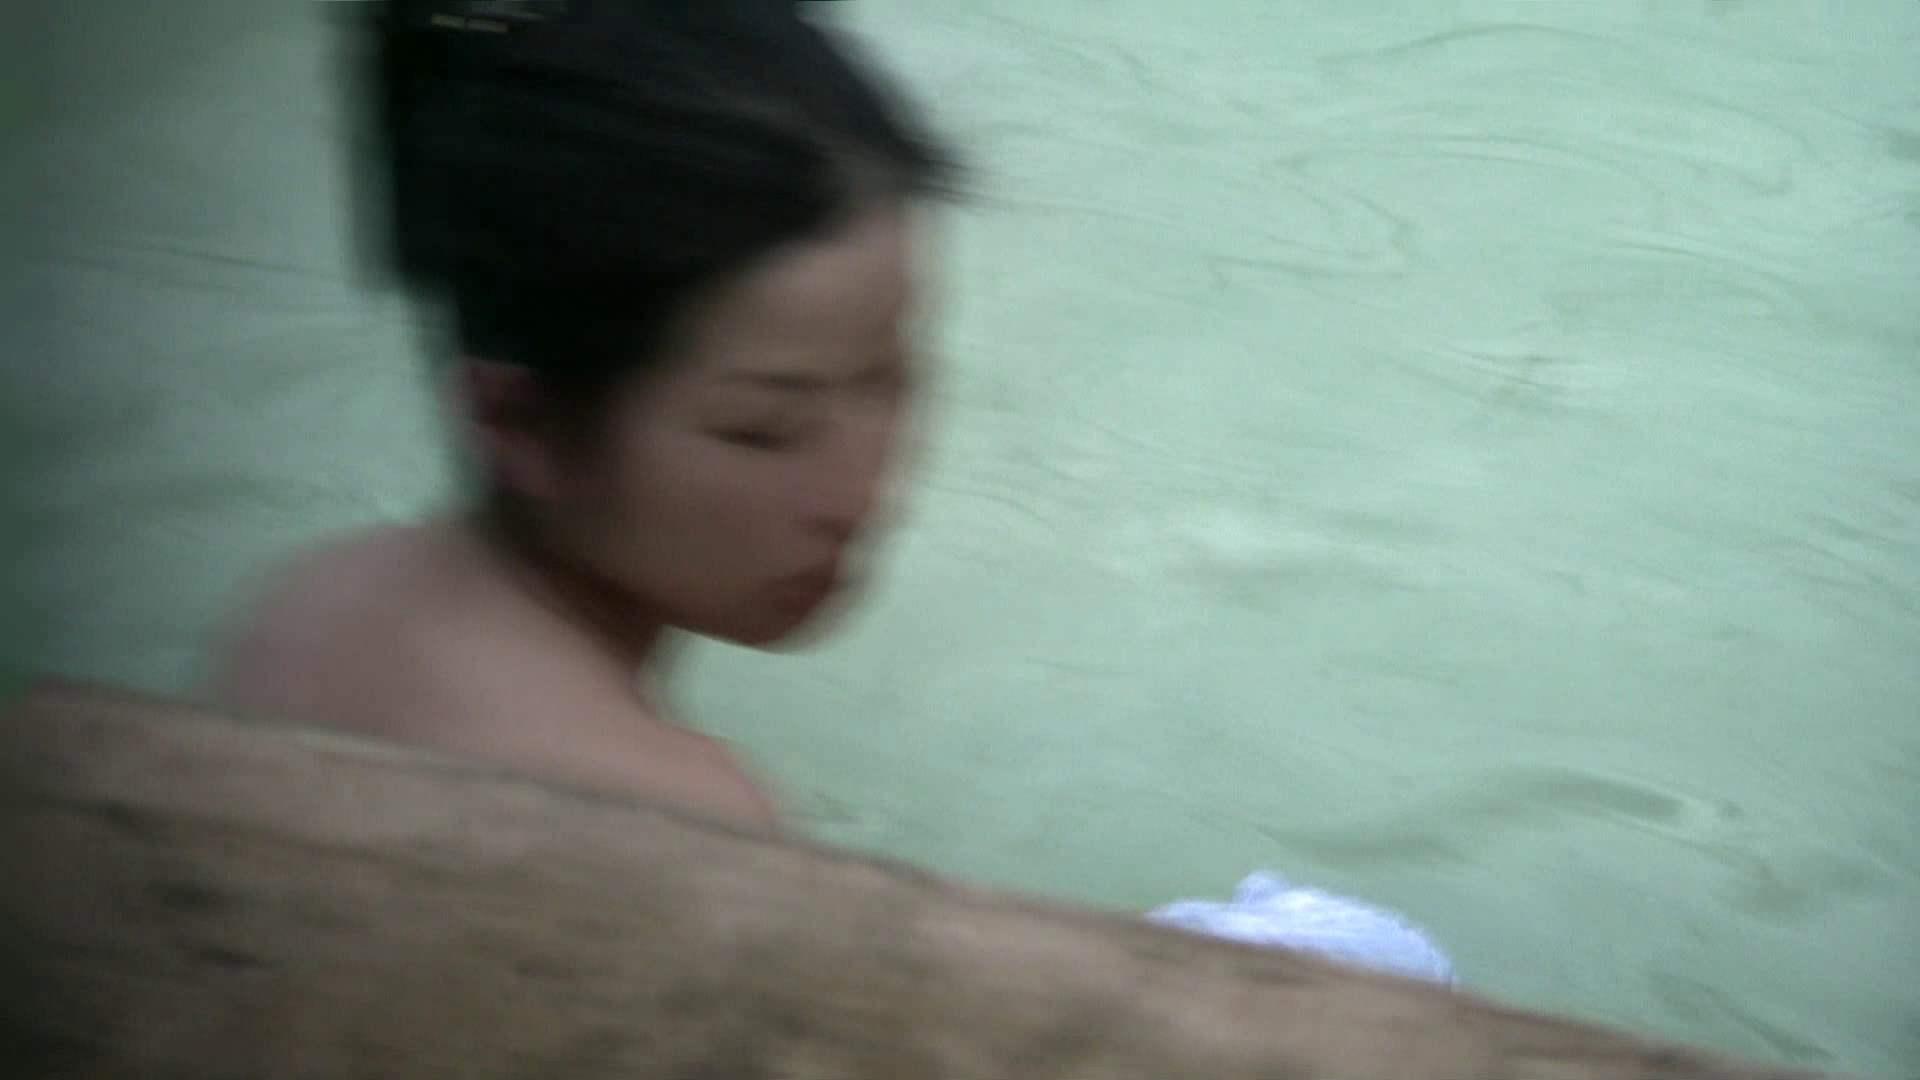 Aquaな露天風呂Vol.656 露天風呂編 | 盗撮シリーズ  91PIX 3